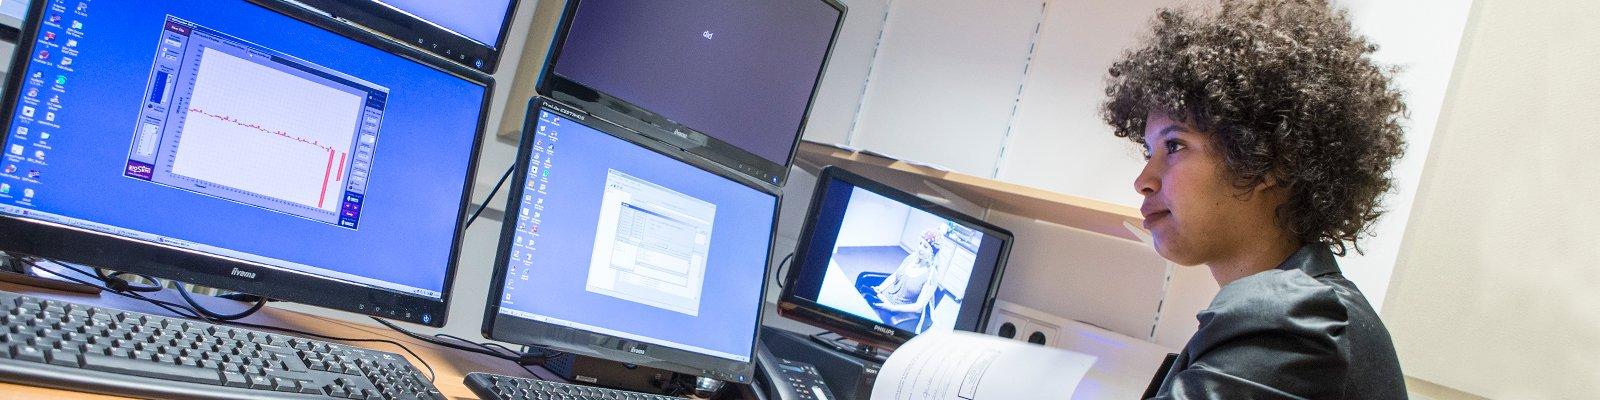 EEG/ERP lab